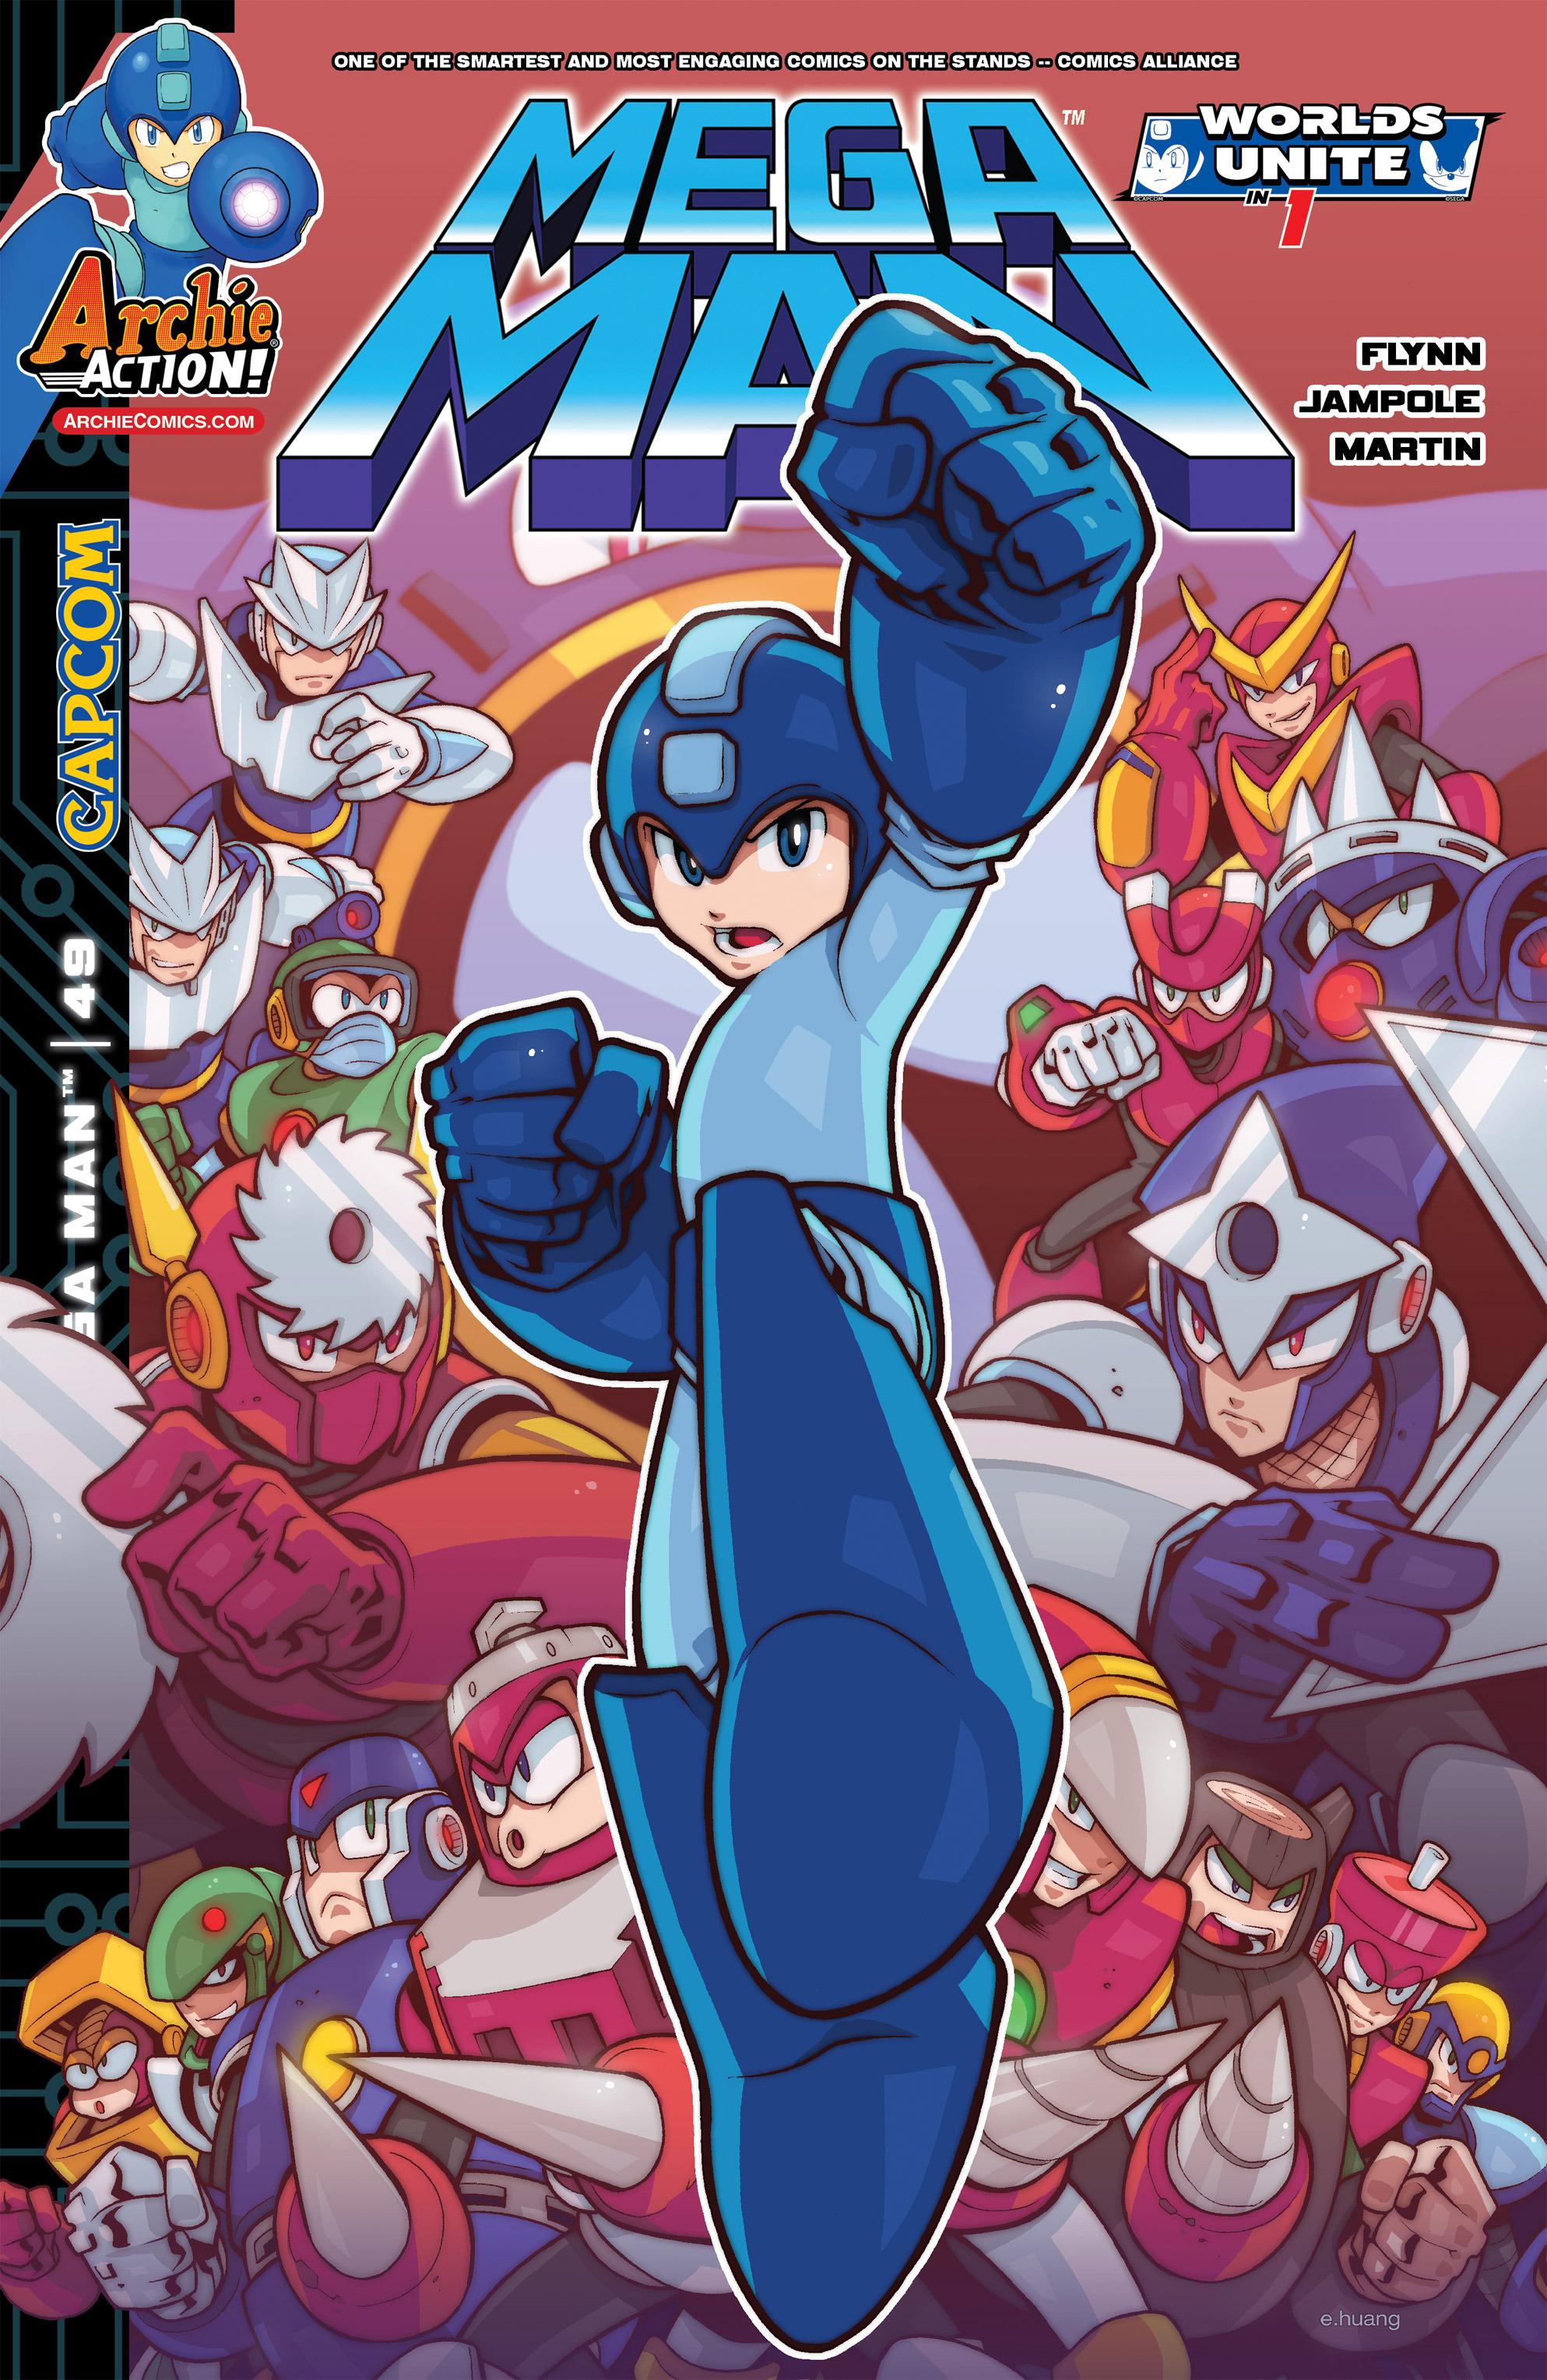 Mega Man Issue 49 Archie Comics Mmkb Fandom Powered